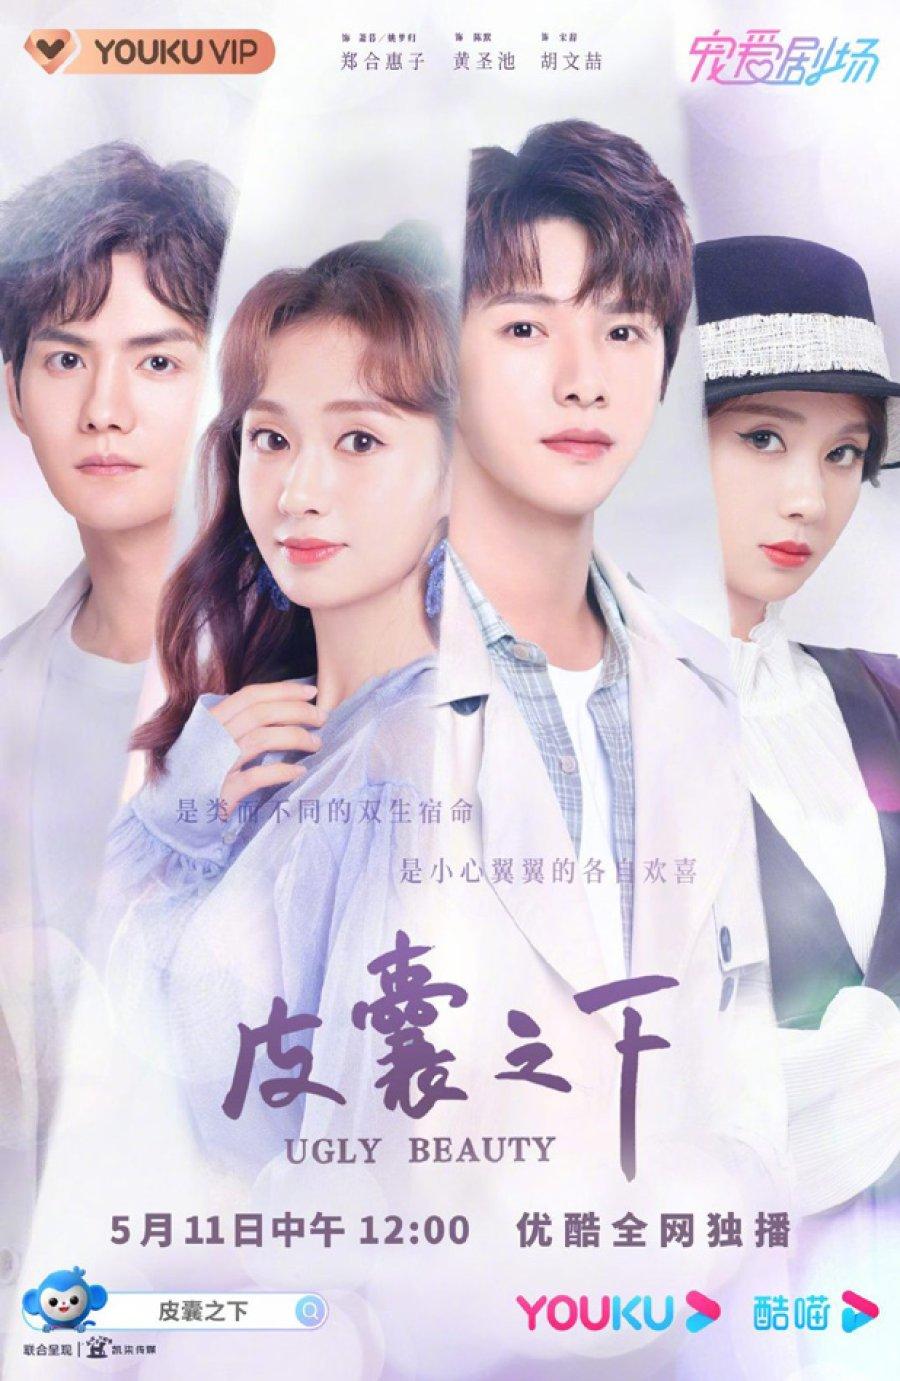 1jBY5 4f - Уродливая красота ✦ 2021 ✦ Китай